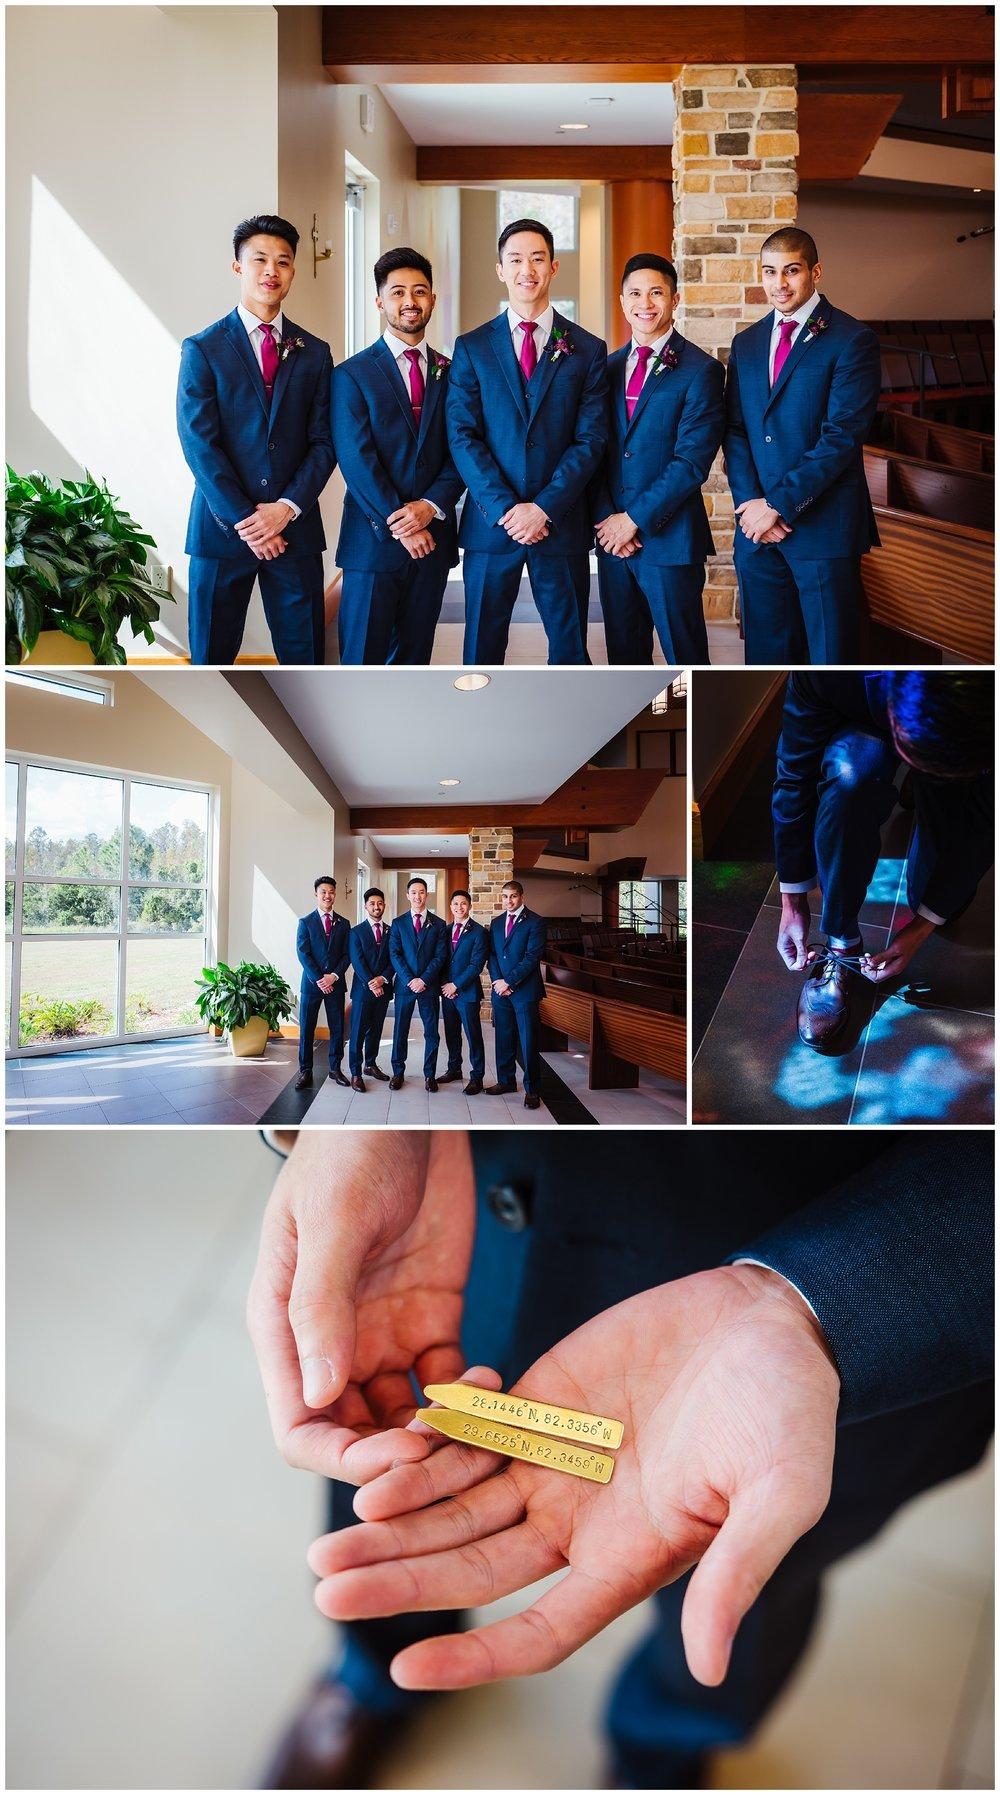 tampa-wedding-photographer-philipino-colorful-woods-ballroom-church-mass-confetti-fuscia_0023.jpg